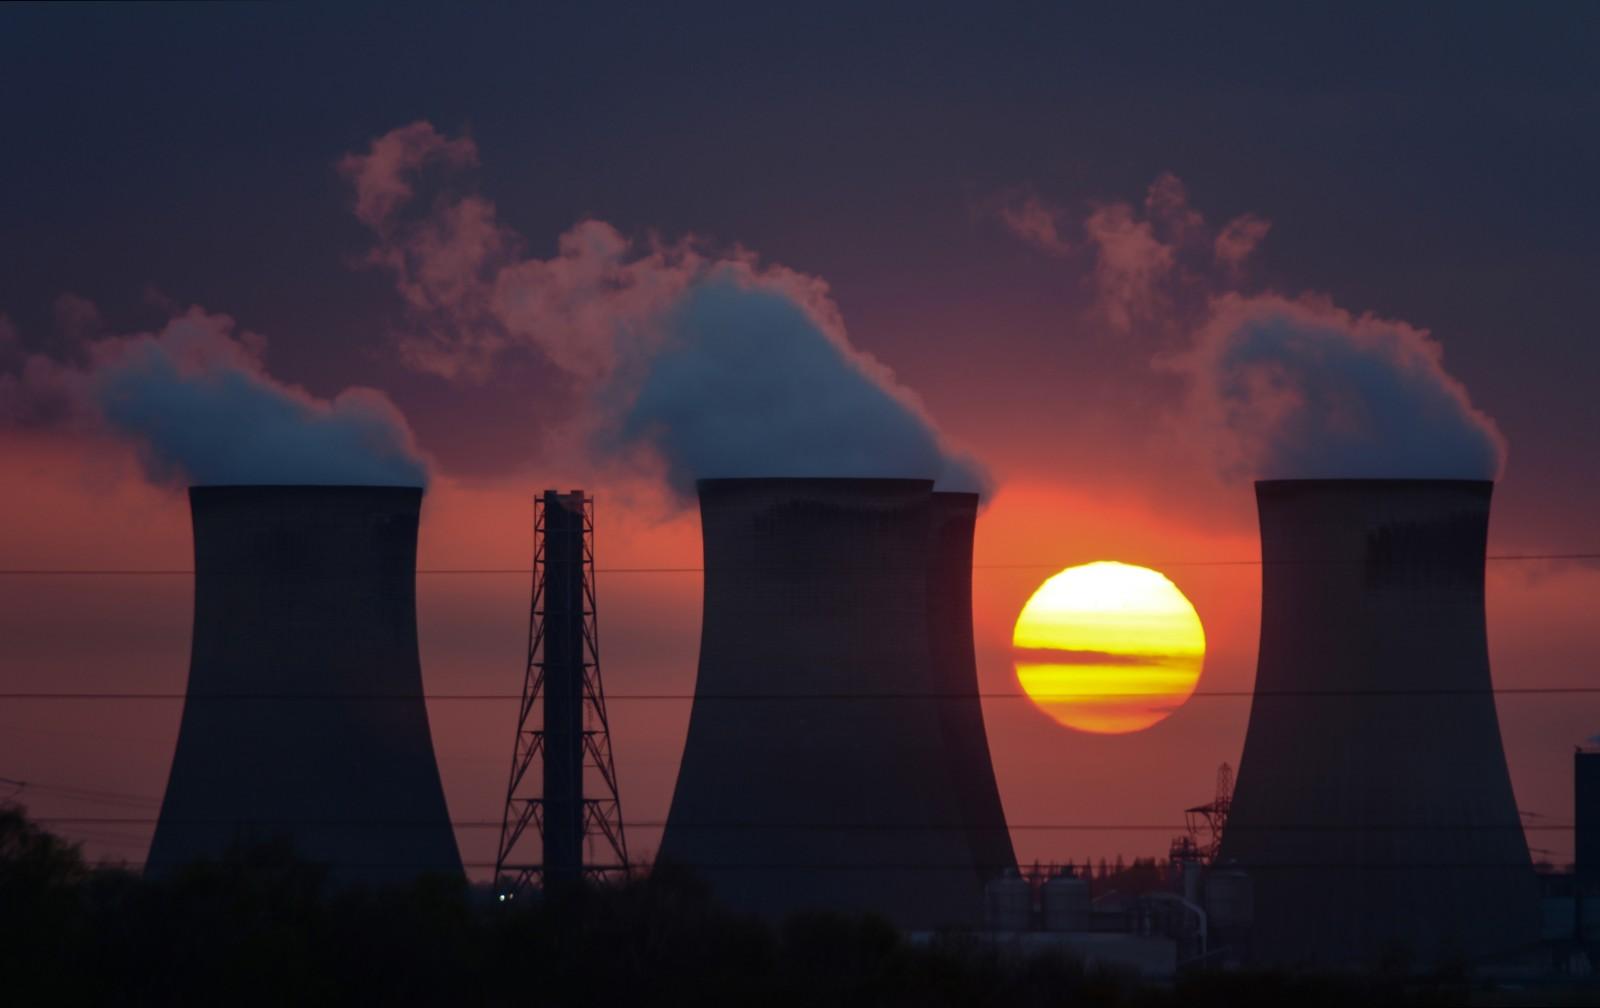 uk_chimney_sky_sun_industry_star_solar_nikon-906224.jpg!d